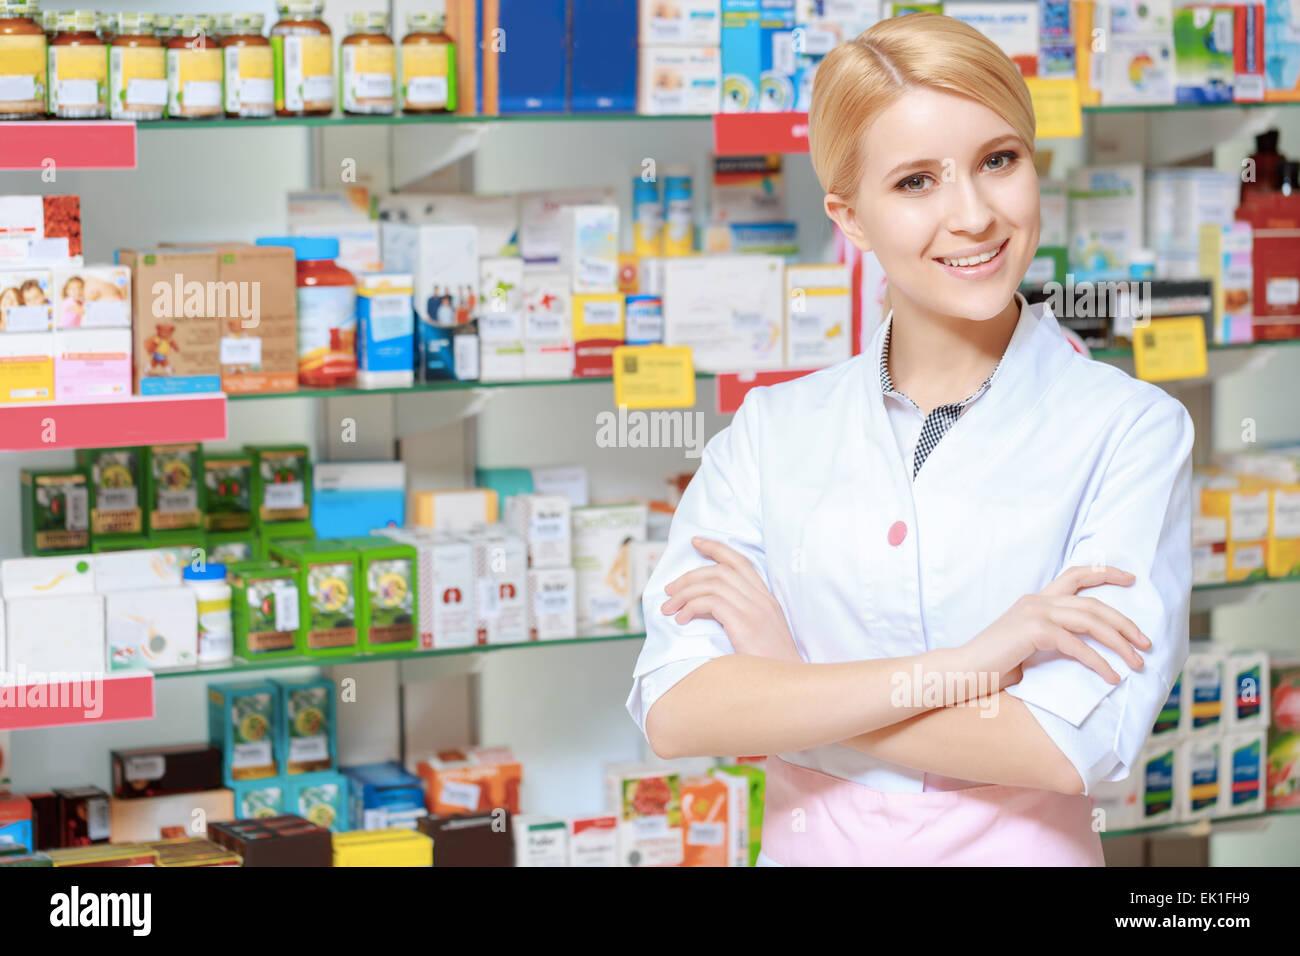 Range of medicine in the drugstore - Stock Image